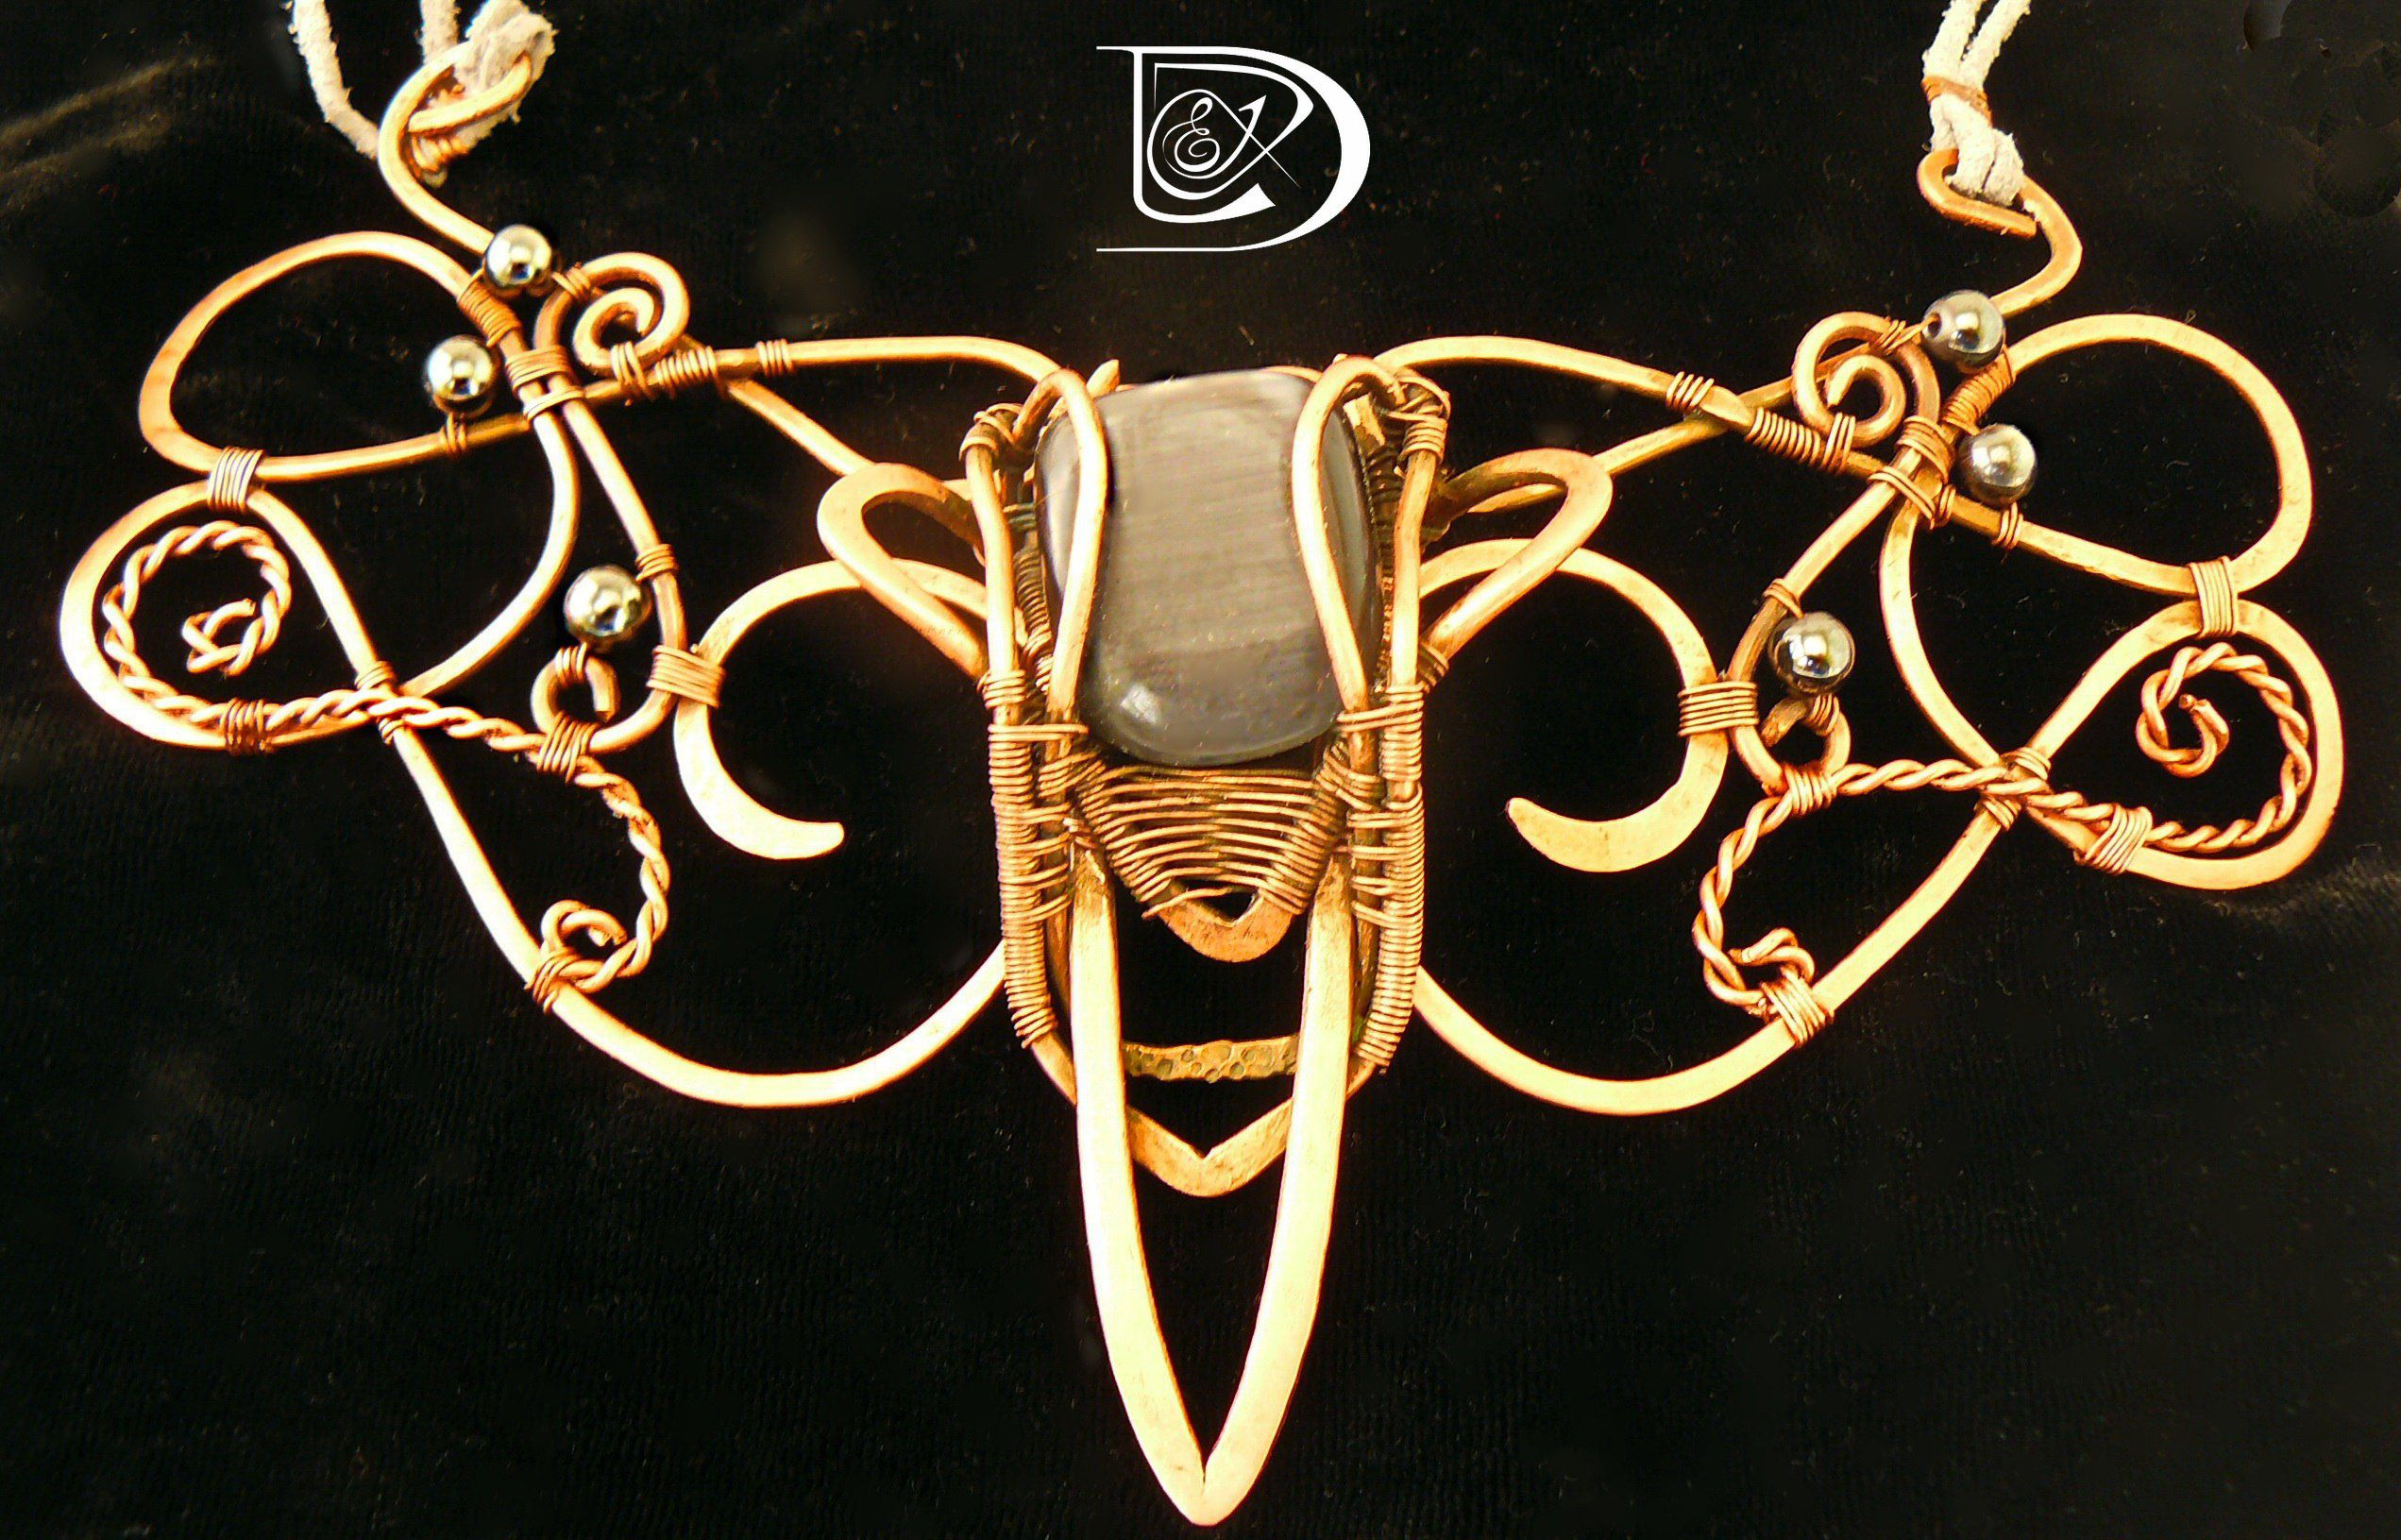 колье кулон медь красота handmade гематит кошачийглаз jewel кольеназаказ эльф wirewrap бижутерия стиль подарок